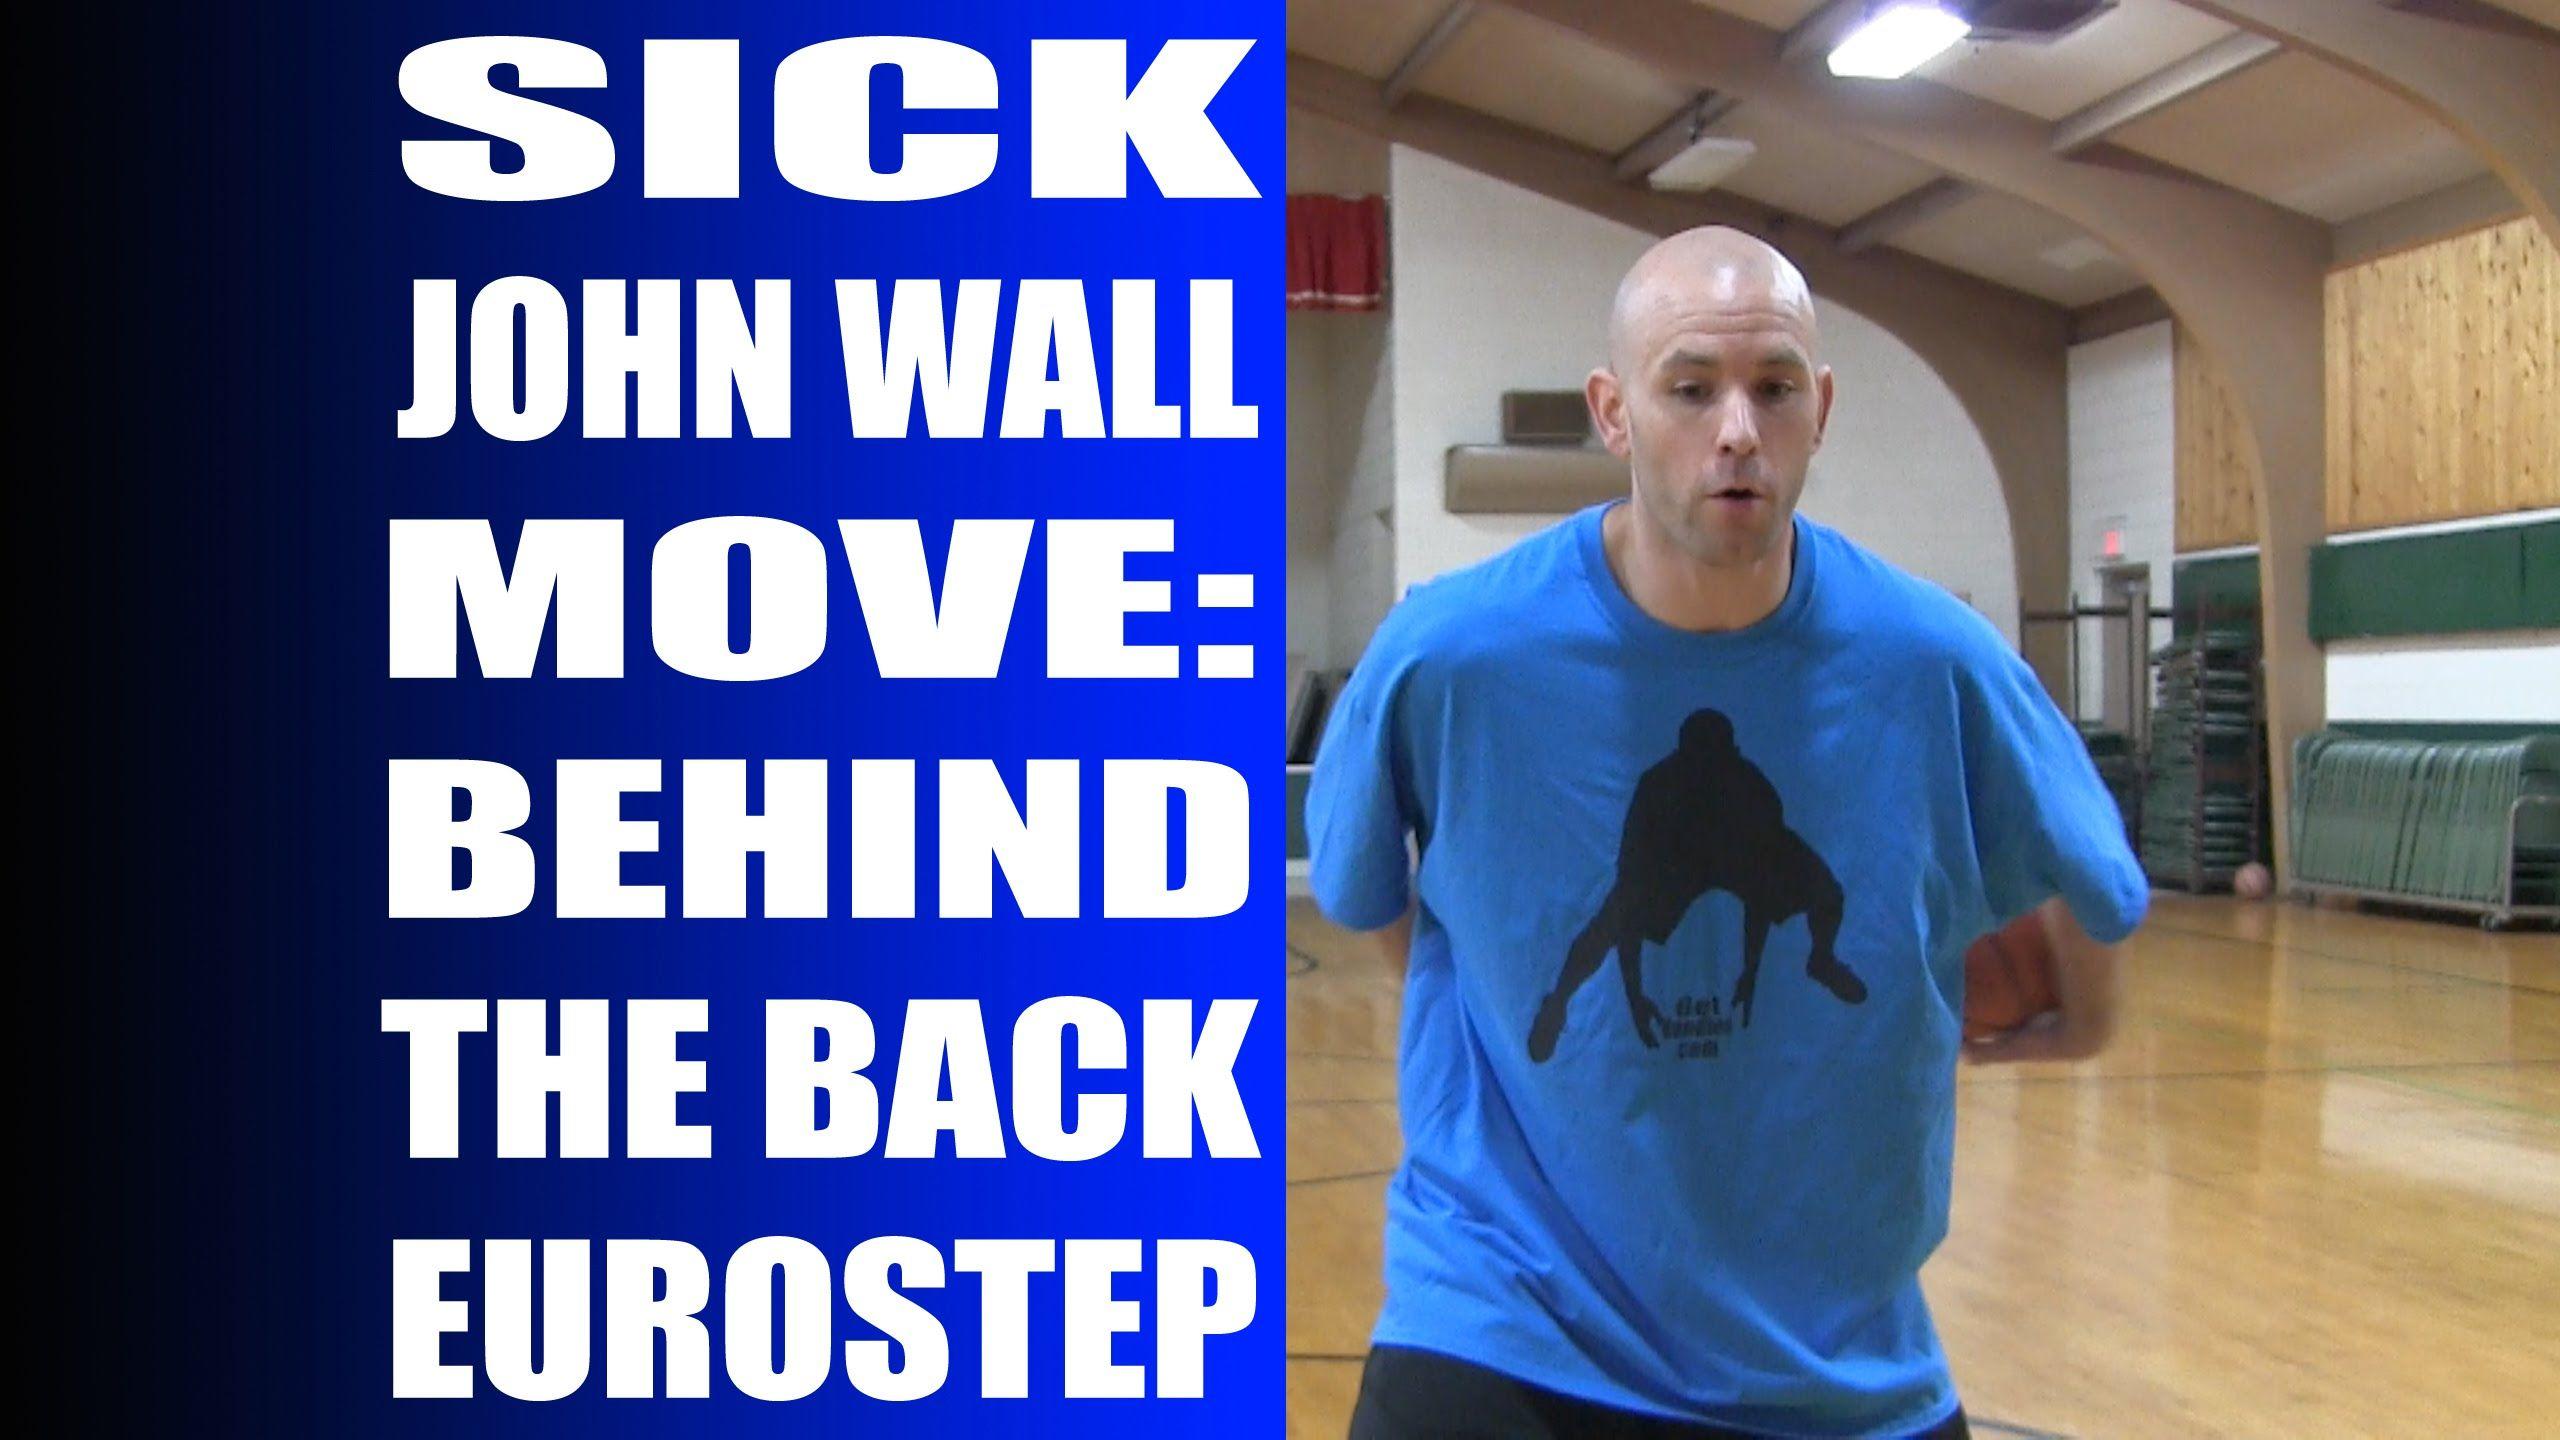 Sick John Wall Basketball Move Behind The Back Eurostep Tutorial